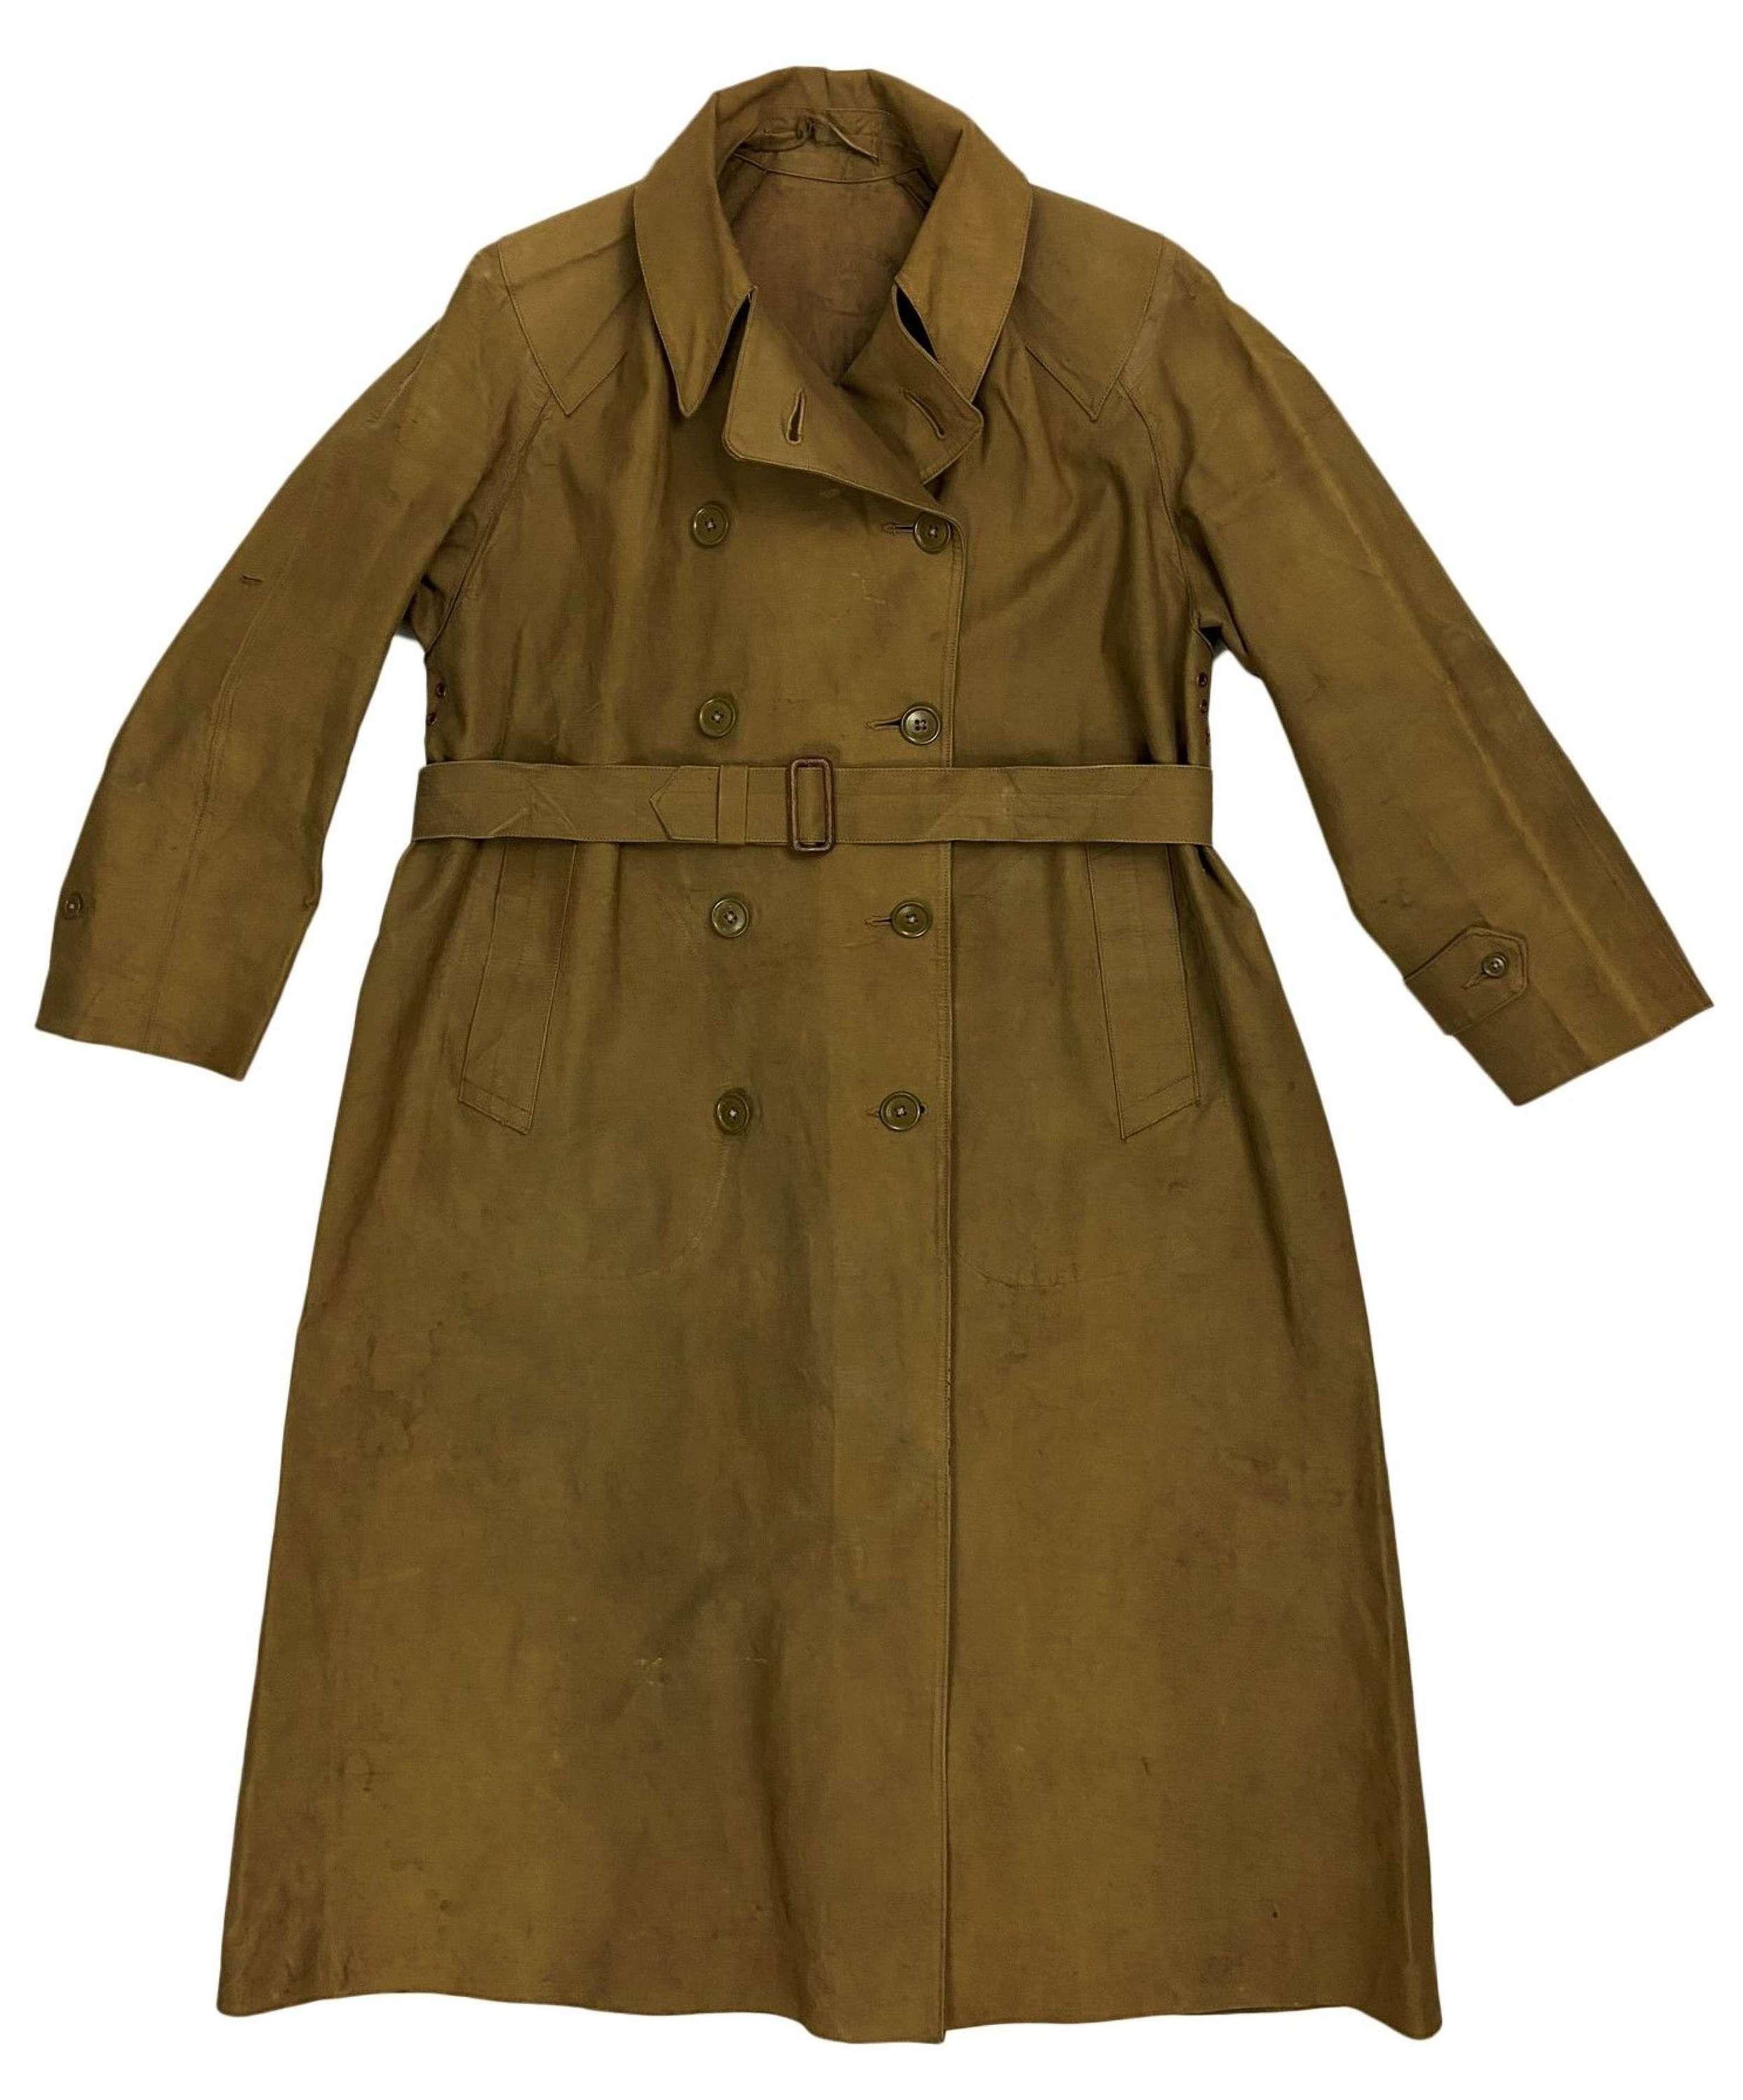 Original 1944 Dated Women's Land Army Raincoat